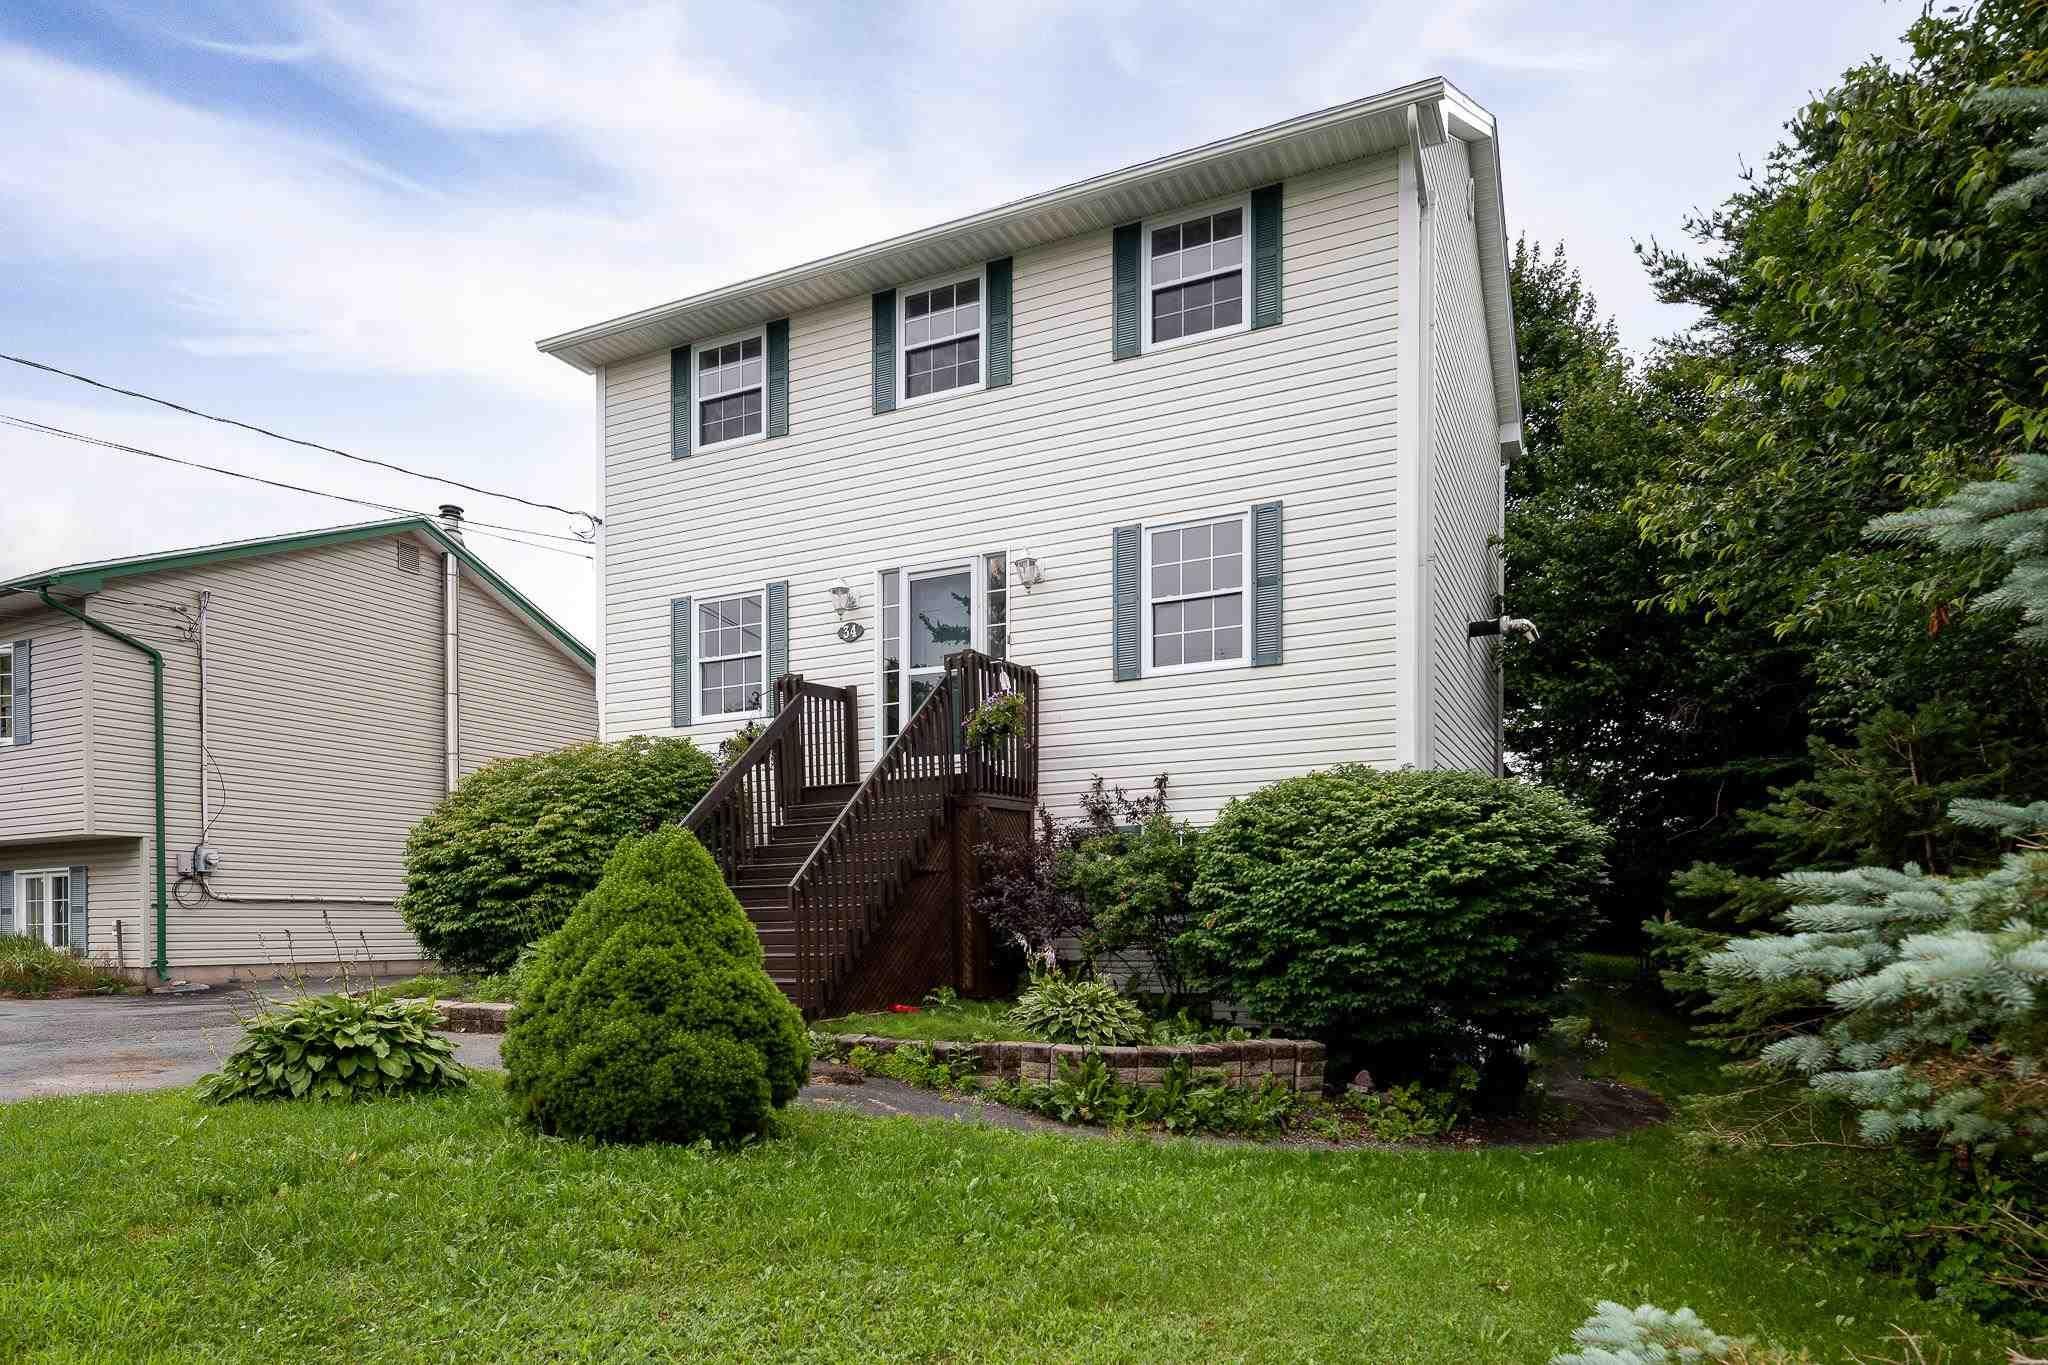 Main Photo: 34 James Street in Timberlea: 40-Timberlea, Prospect, St. Margaret`S Bay Residential for sale (Halifax-Dartmouth)  : MLS®# 202118627